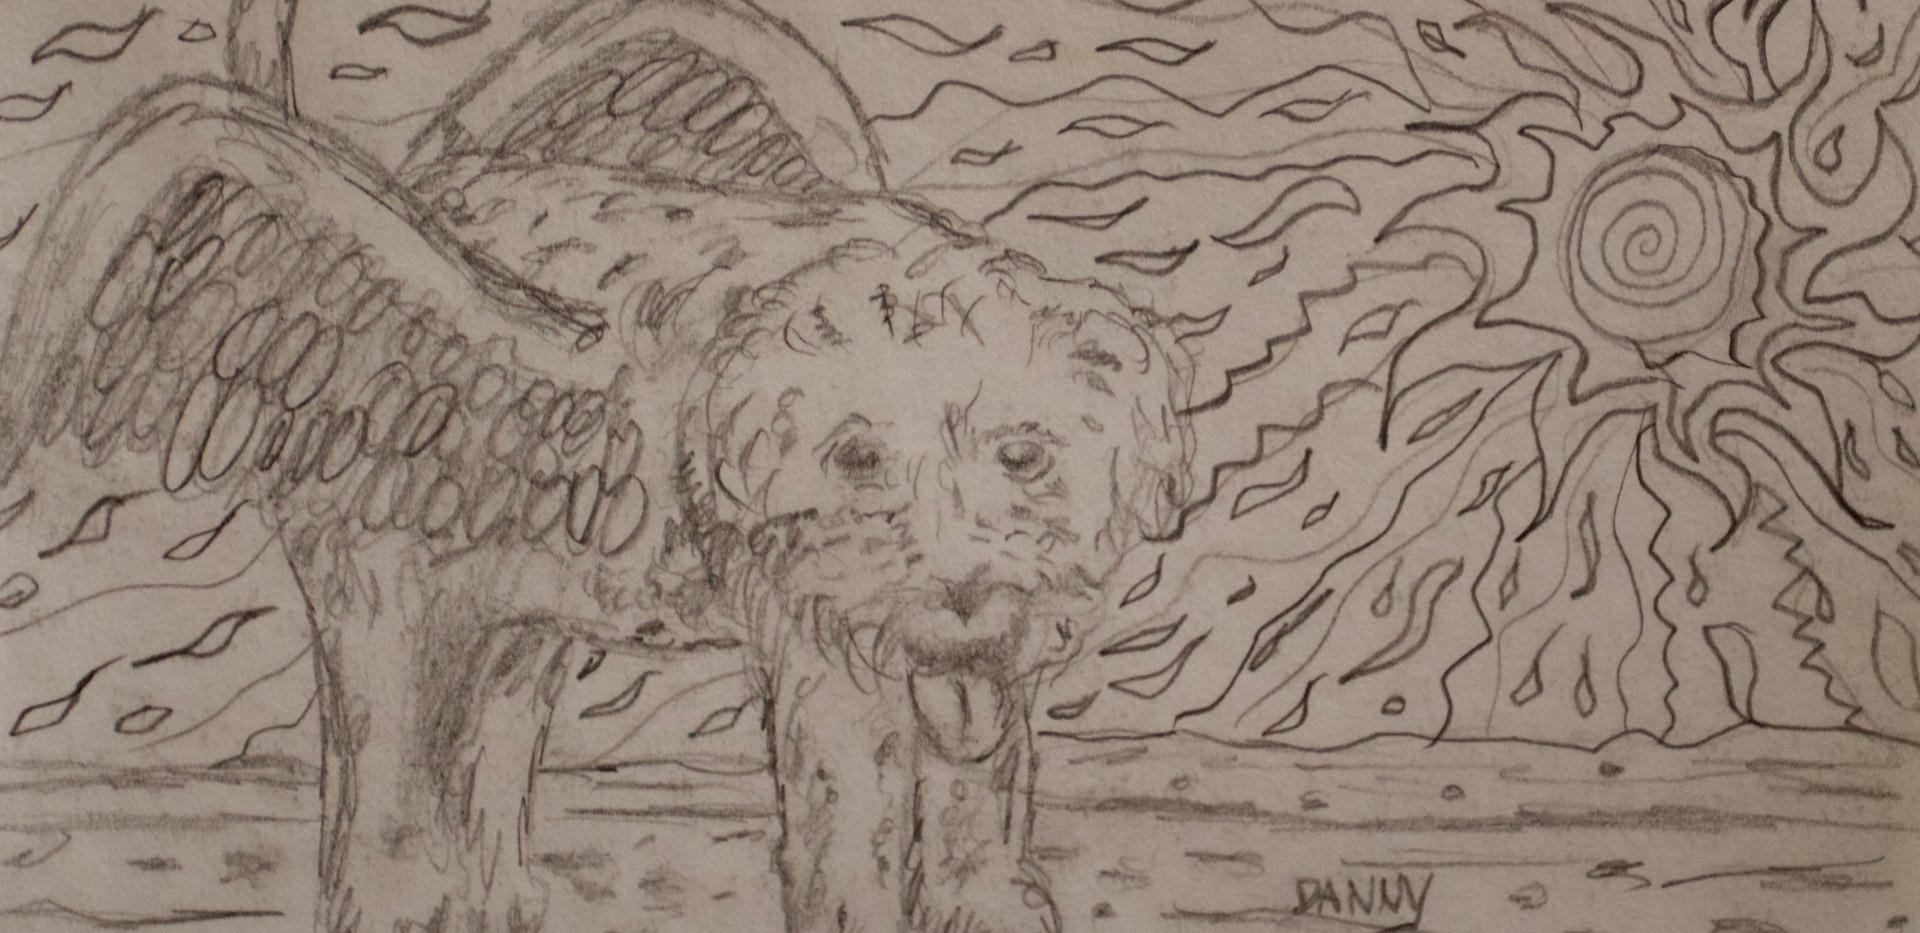 Best Friend. Pencil on Paper.